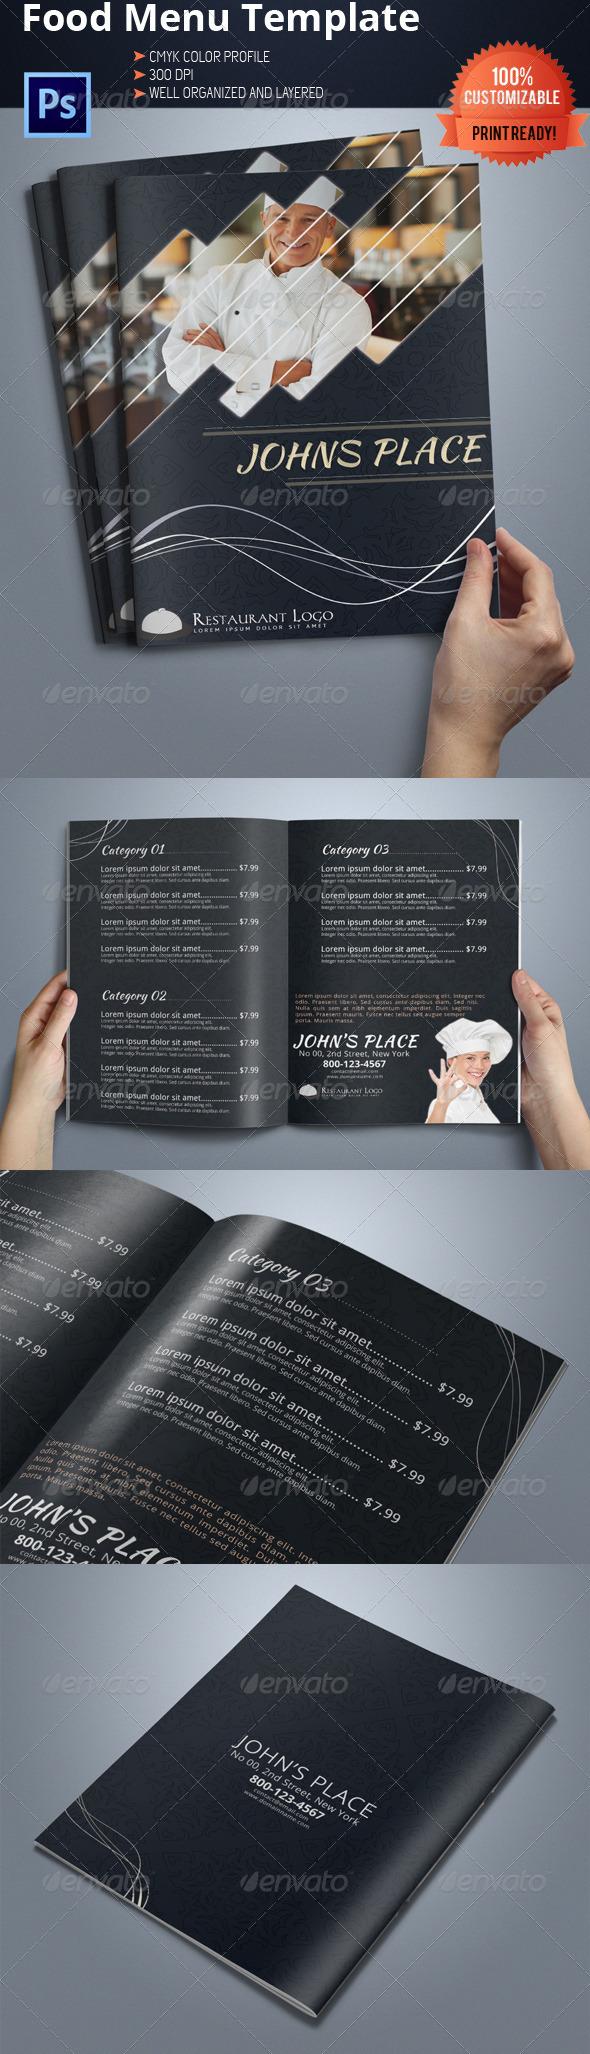 Bi-fold Restaurant Food Menu Template 04 - Food Menus Print Templates